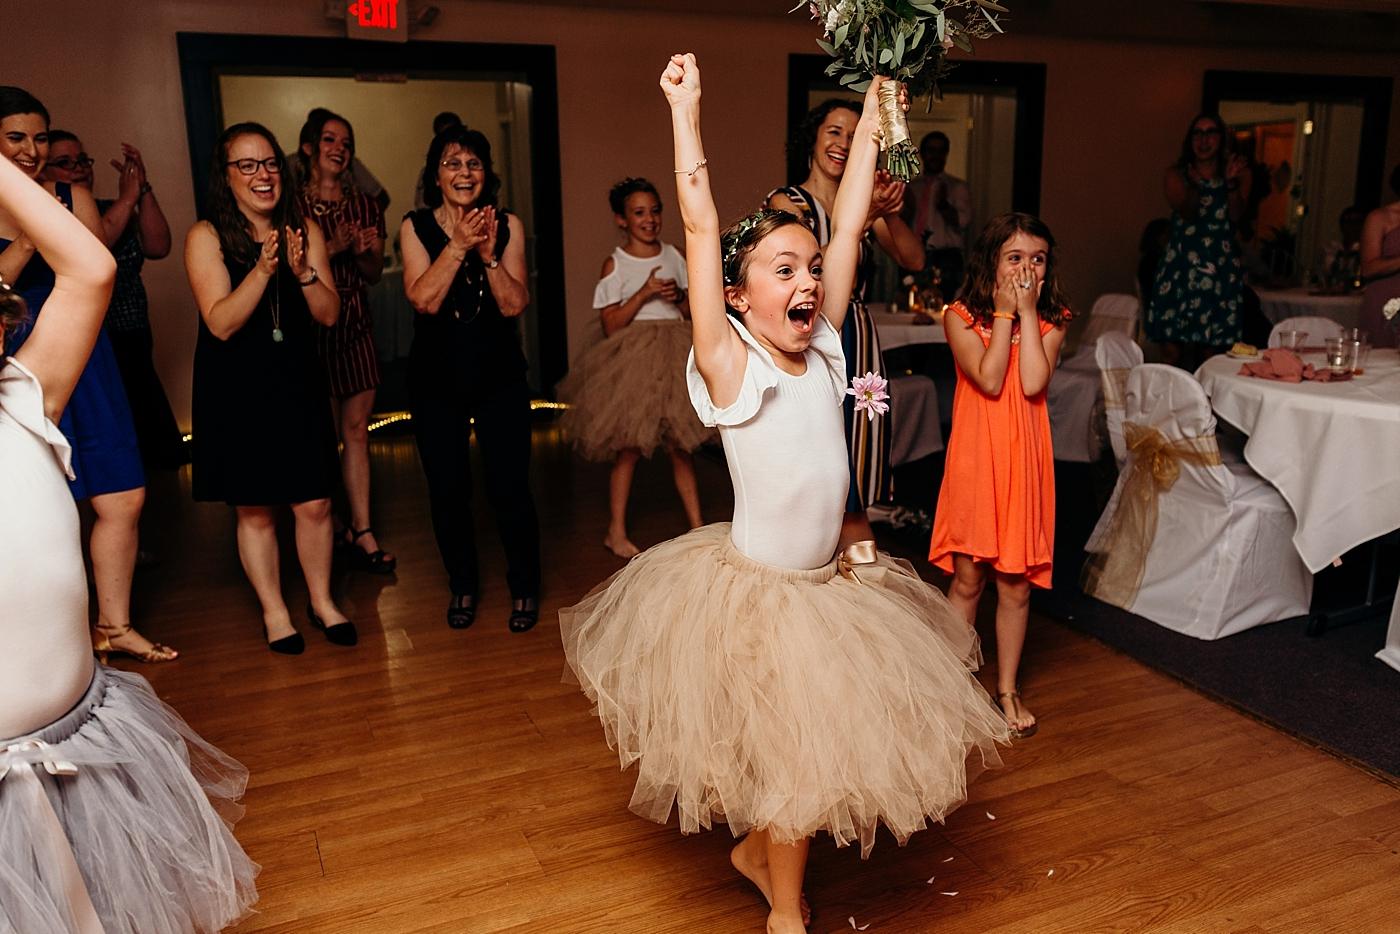 Chateau-Michelle-Wedding-Julia+JuanLuis_TheHeartlandersCo2018LA-469.jpg